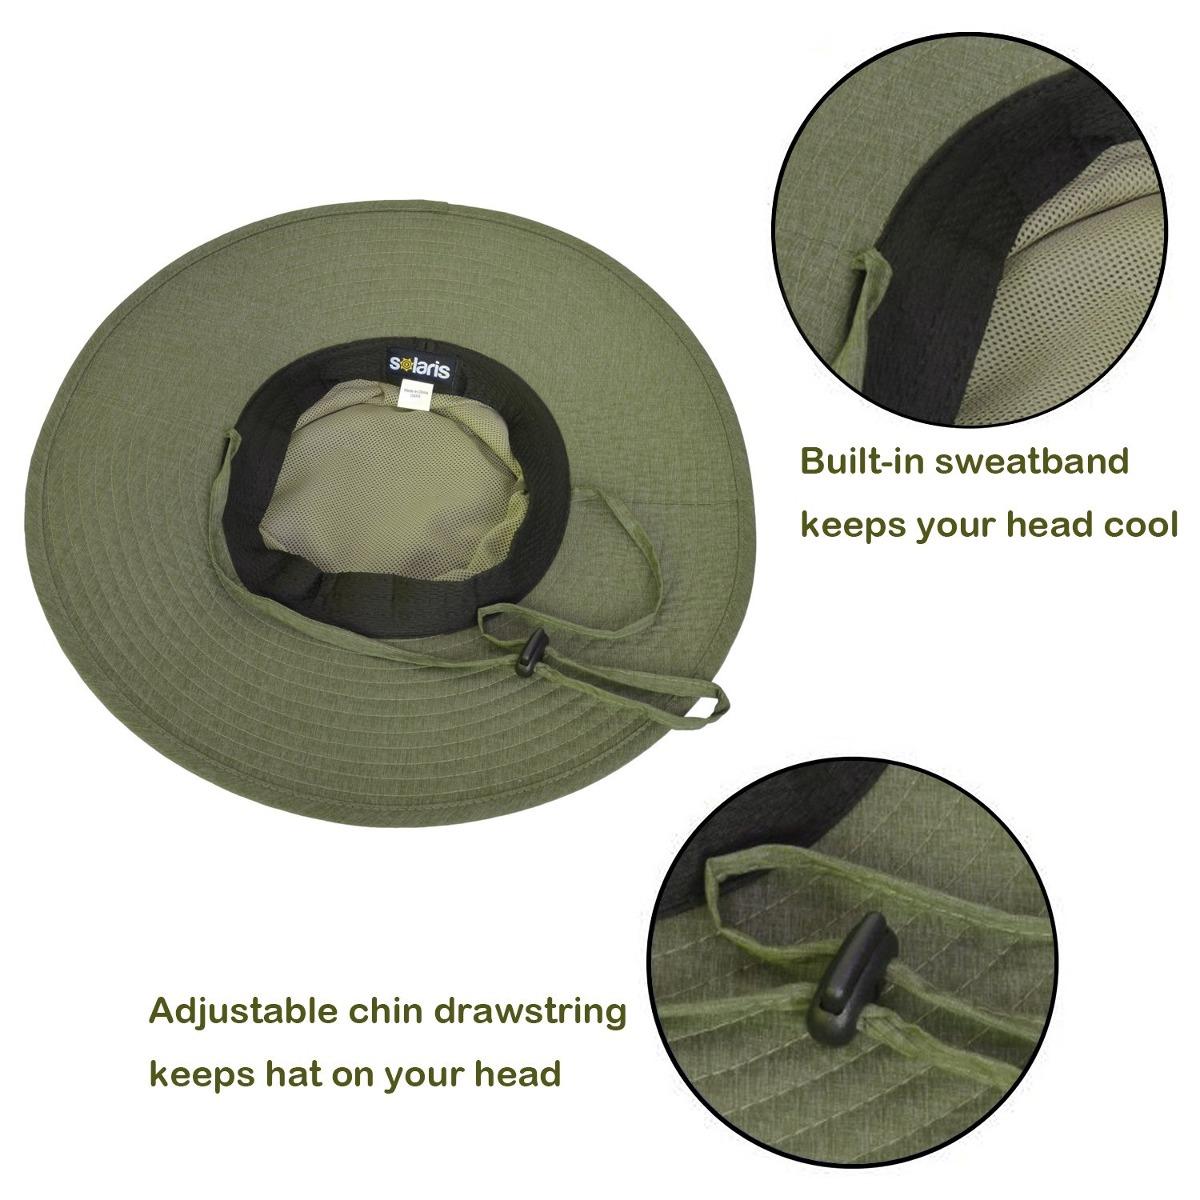 Solaris Outdoor Sun Protection Hat Sombrero Ancho Safari. - U S 44 ... 9edb4698818